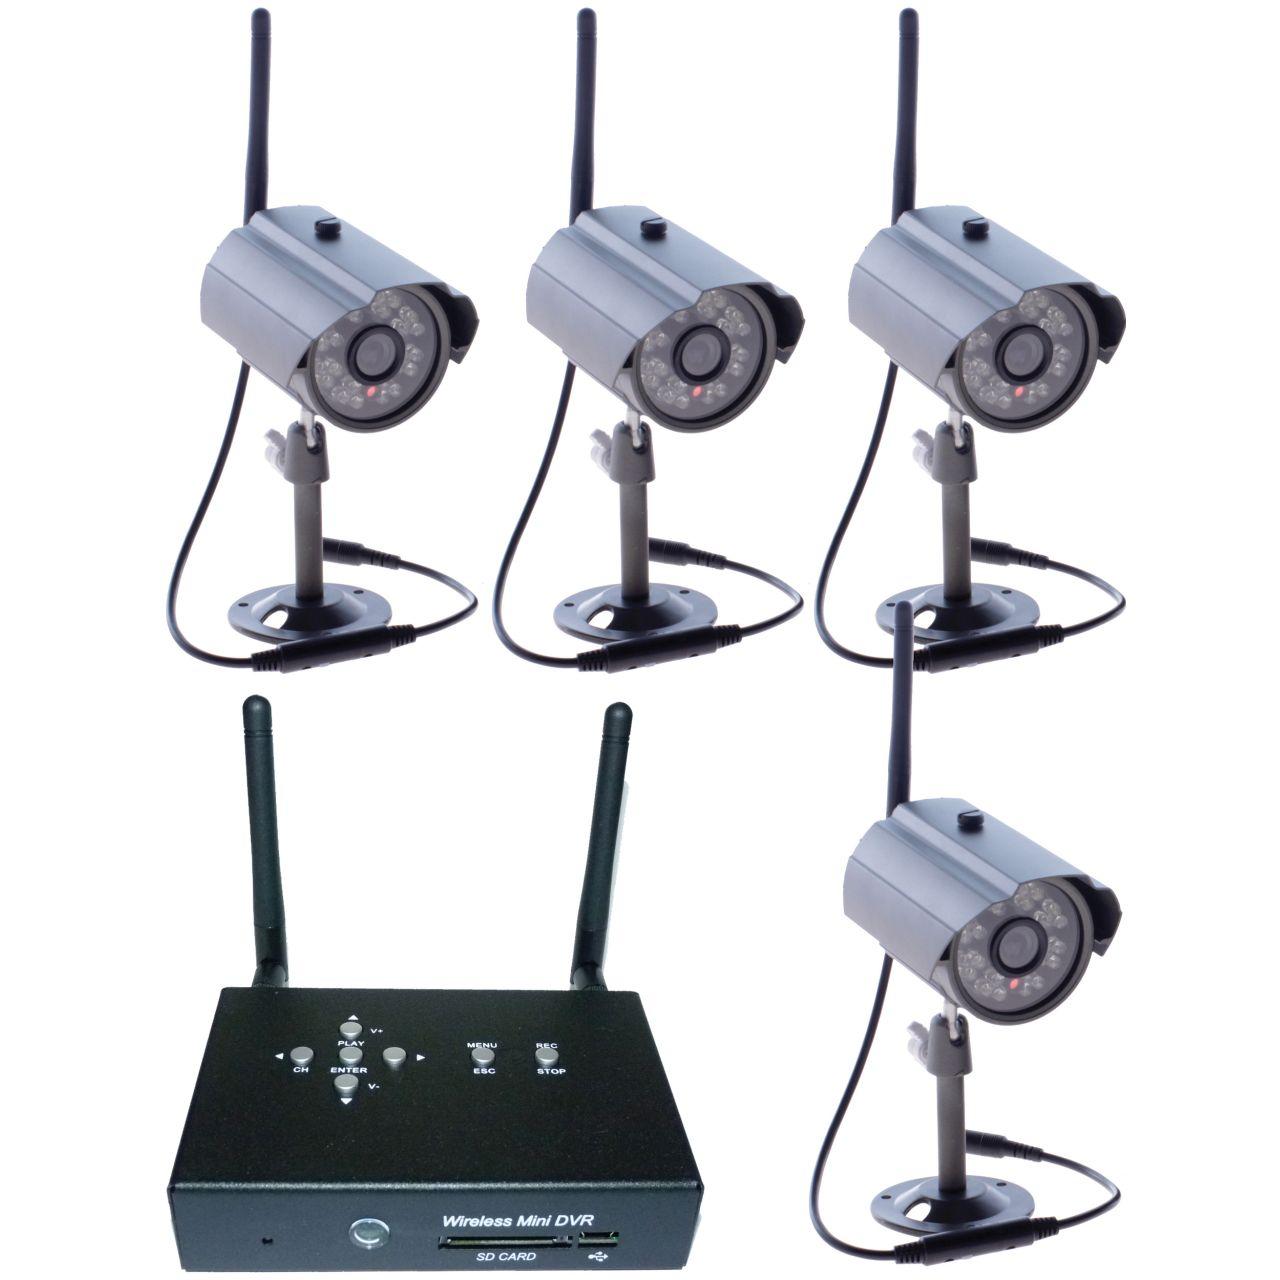 Zestaw monitoringu - 4 x kamera zewnętrzna HD i odbiornik - SET4ch_LAN2